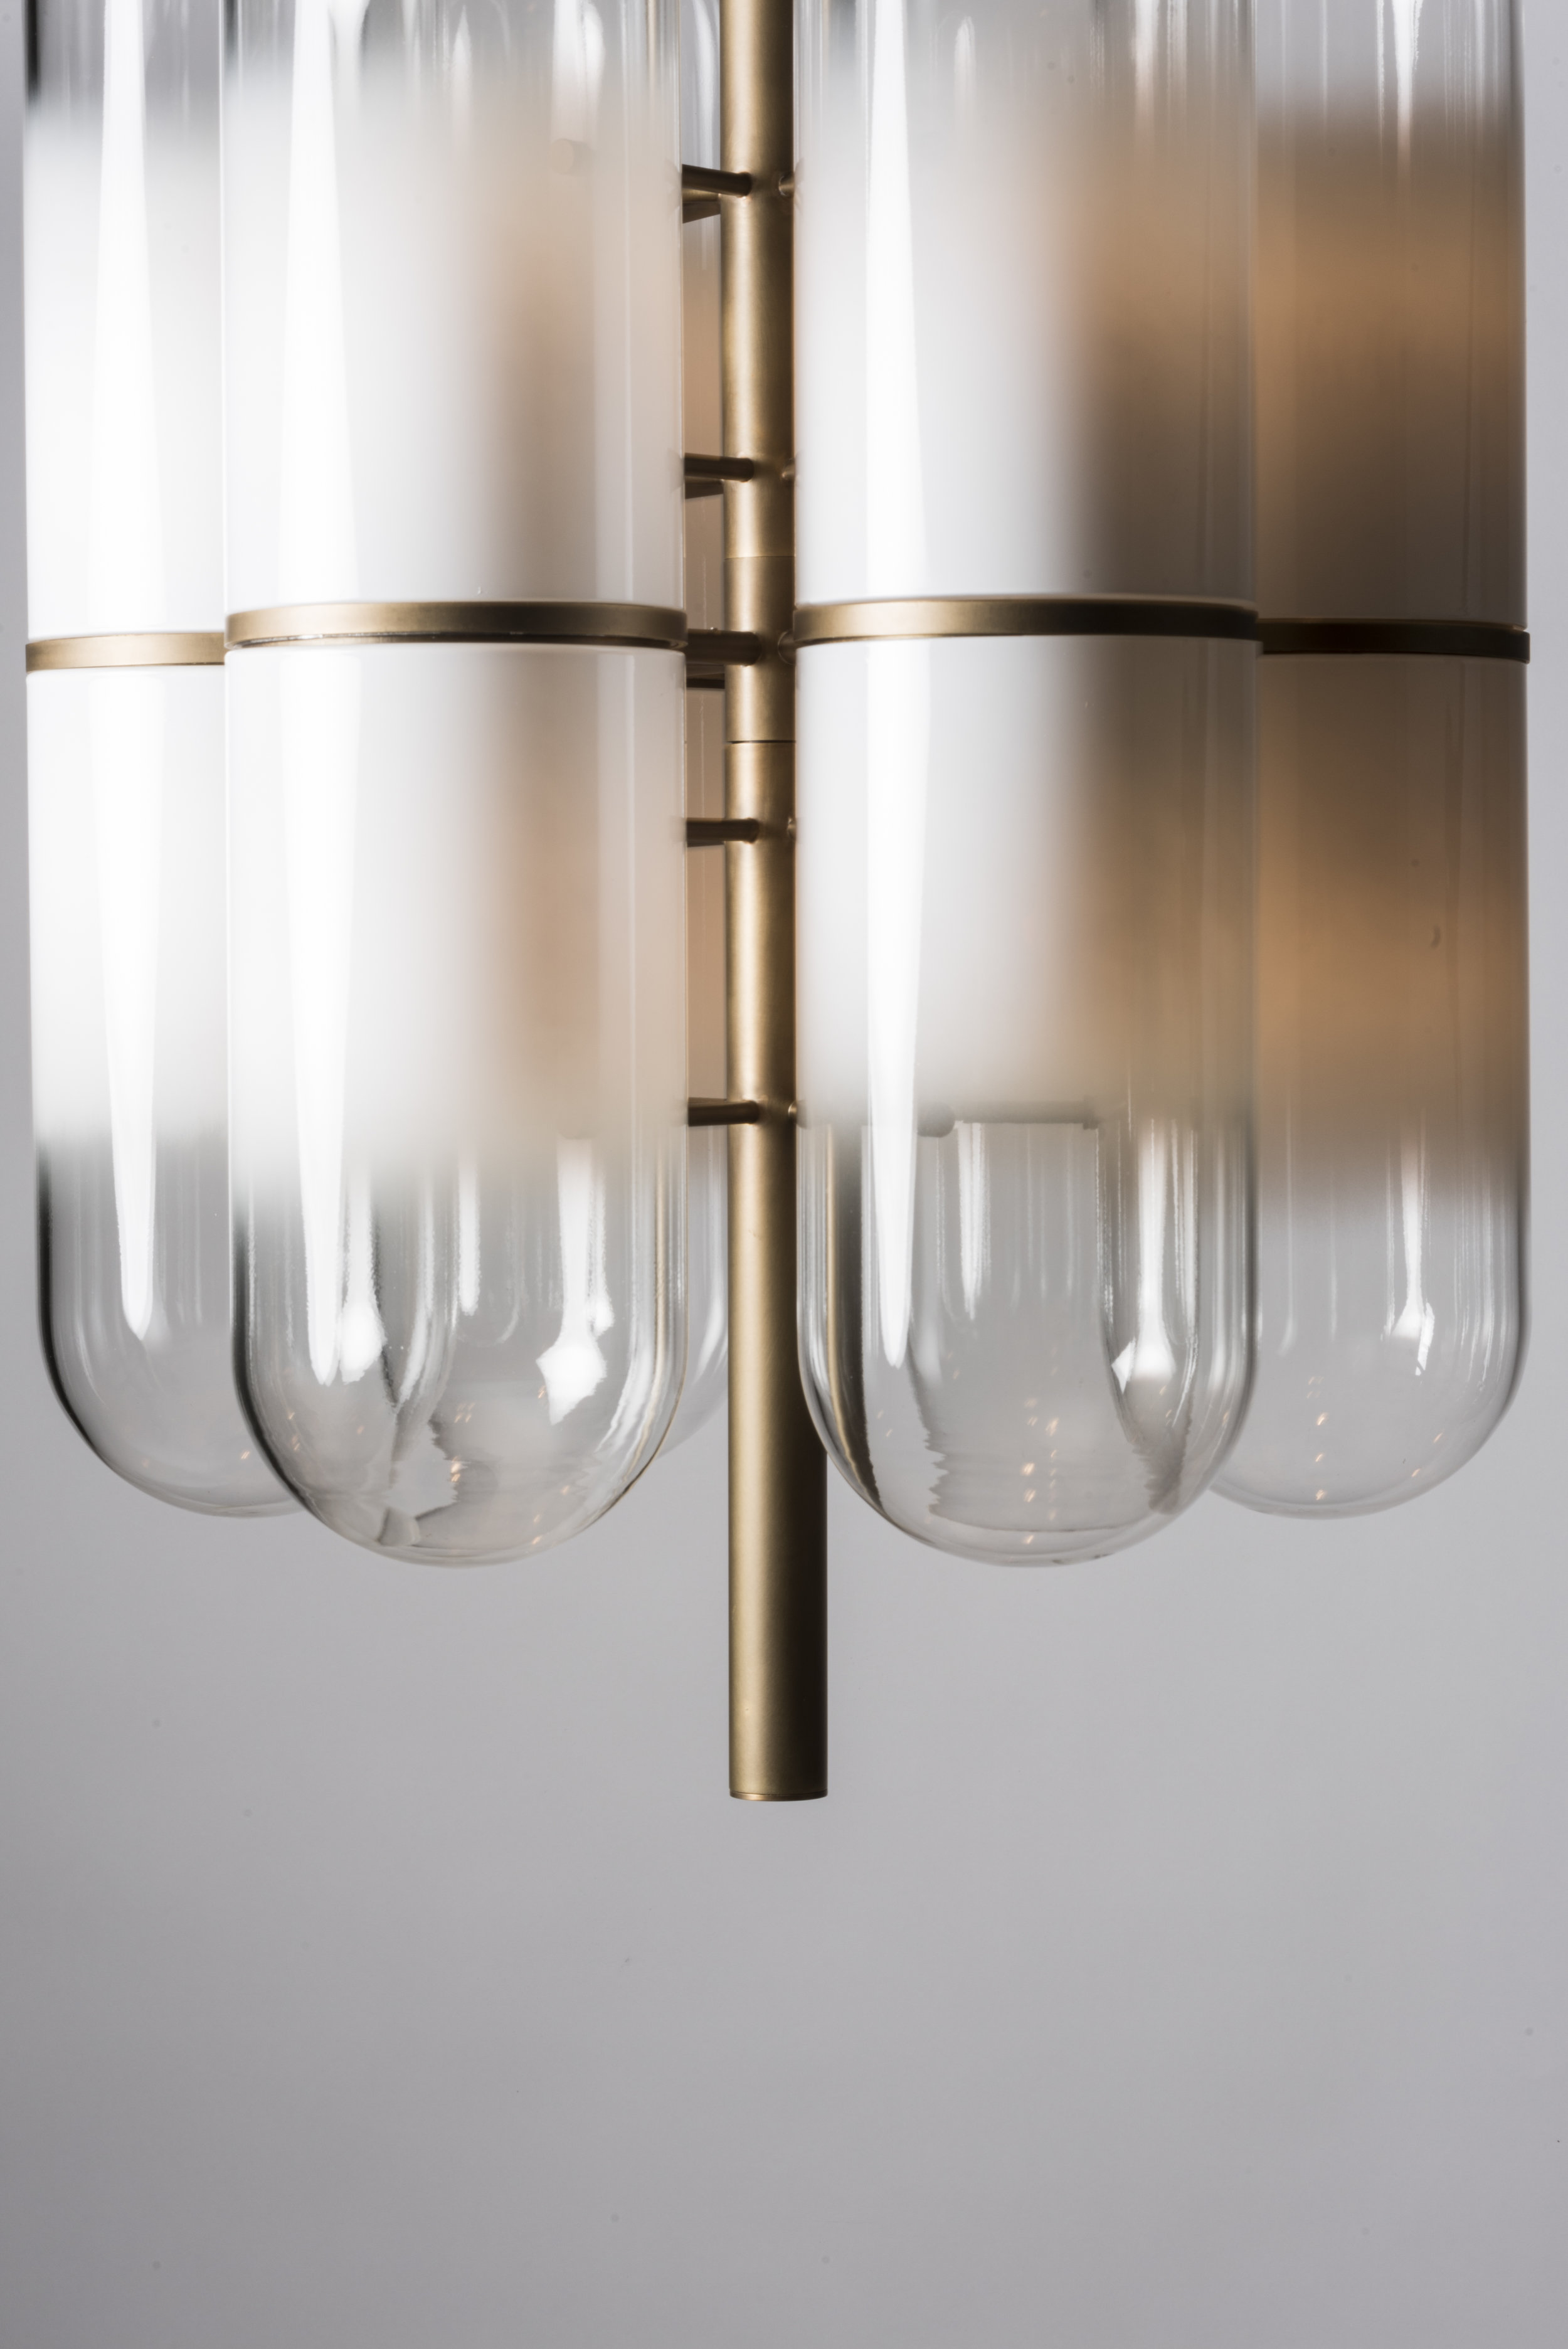 Federico Peri_Charlotte lamp M_Nilufar gallery_02©Daniele Iodice.jpg